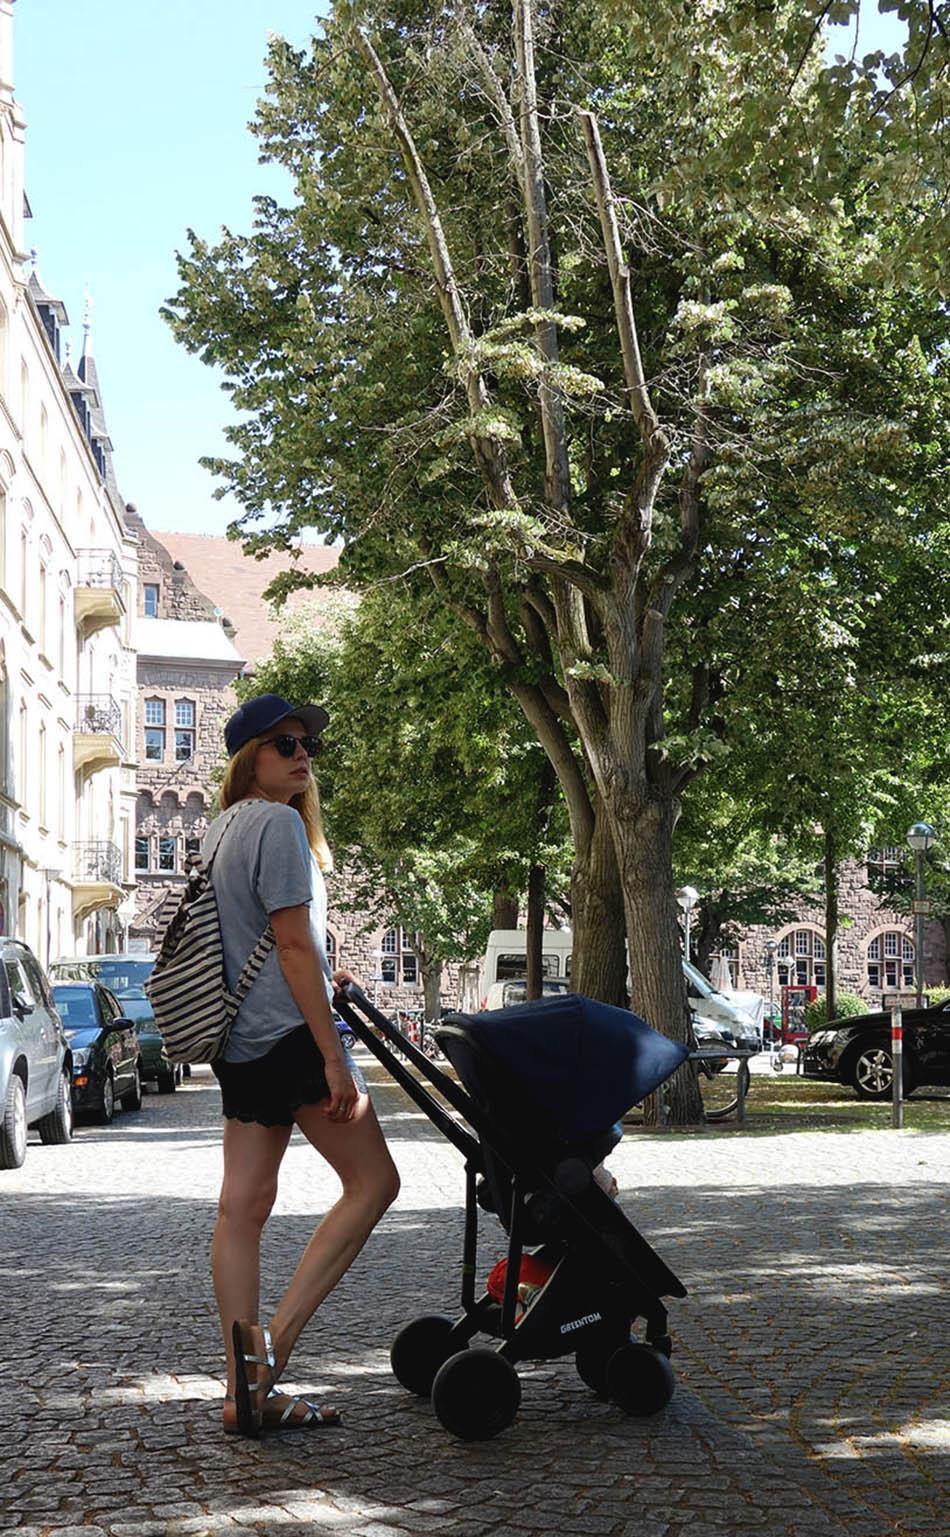 Kinderwagen im Test Greentom Upp 3in1 - Grün, stilvoll, funktional, nachhaltig, kinderwagen modern, alternative joolz, ekulele, mumblog, mamablog, alltag mit kind, streetstyle, mumlife (6)